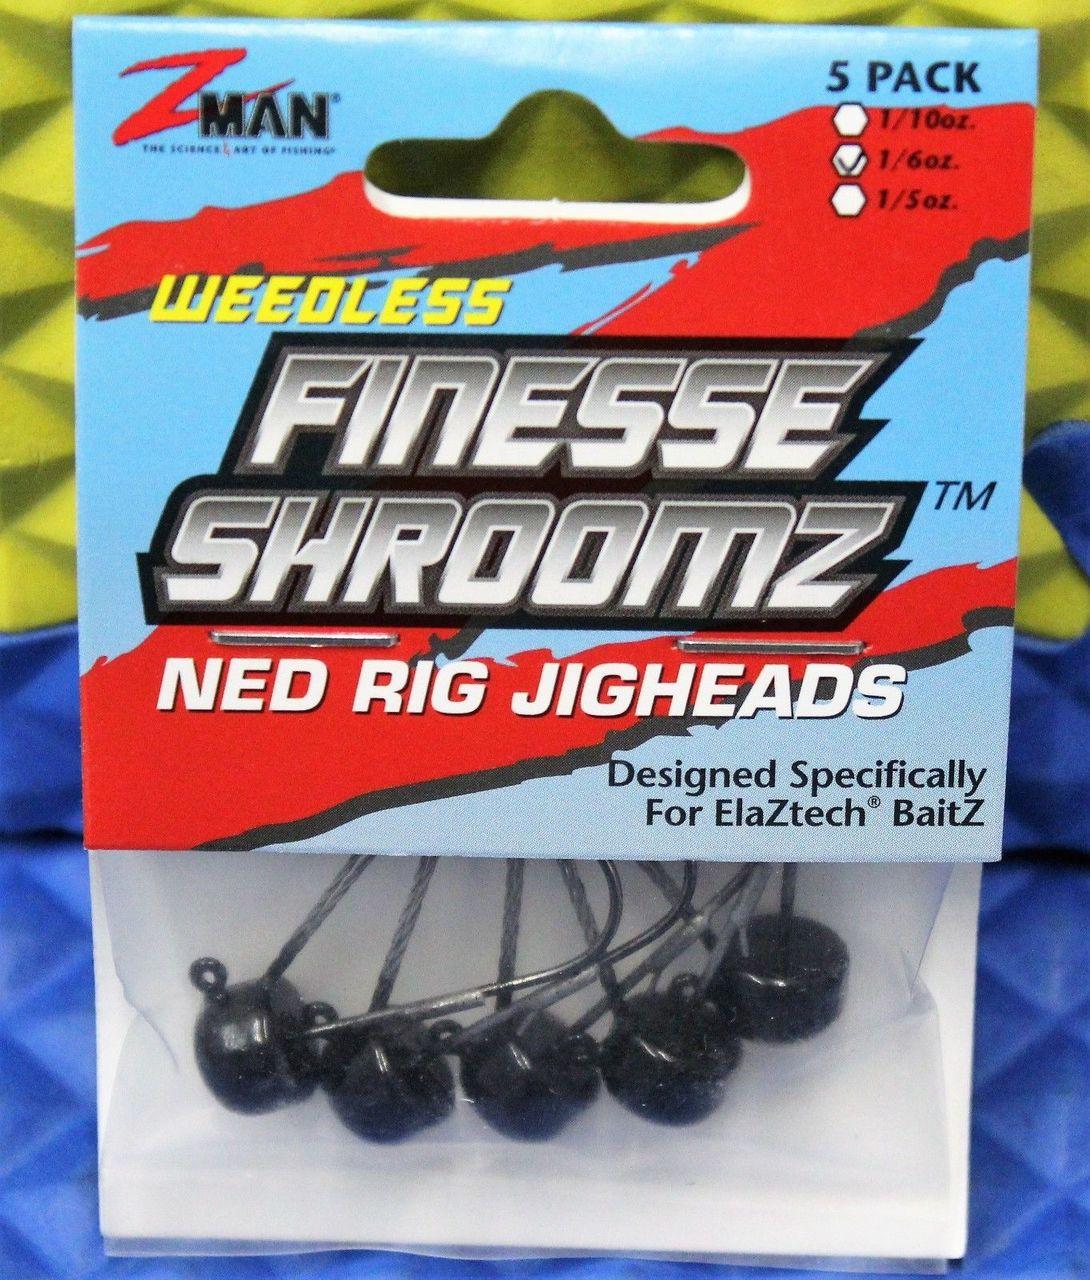 Select Size Z Man Weedless Pro ShroomZ Green Pumpkin Ned Rig Jigheads 4 PK